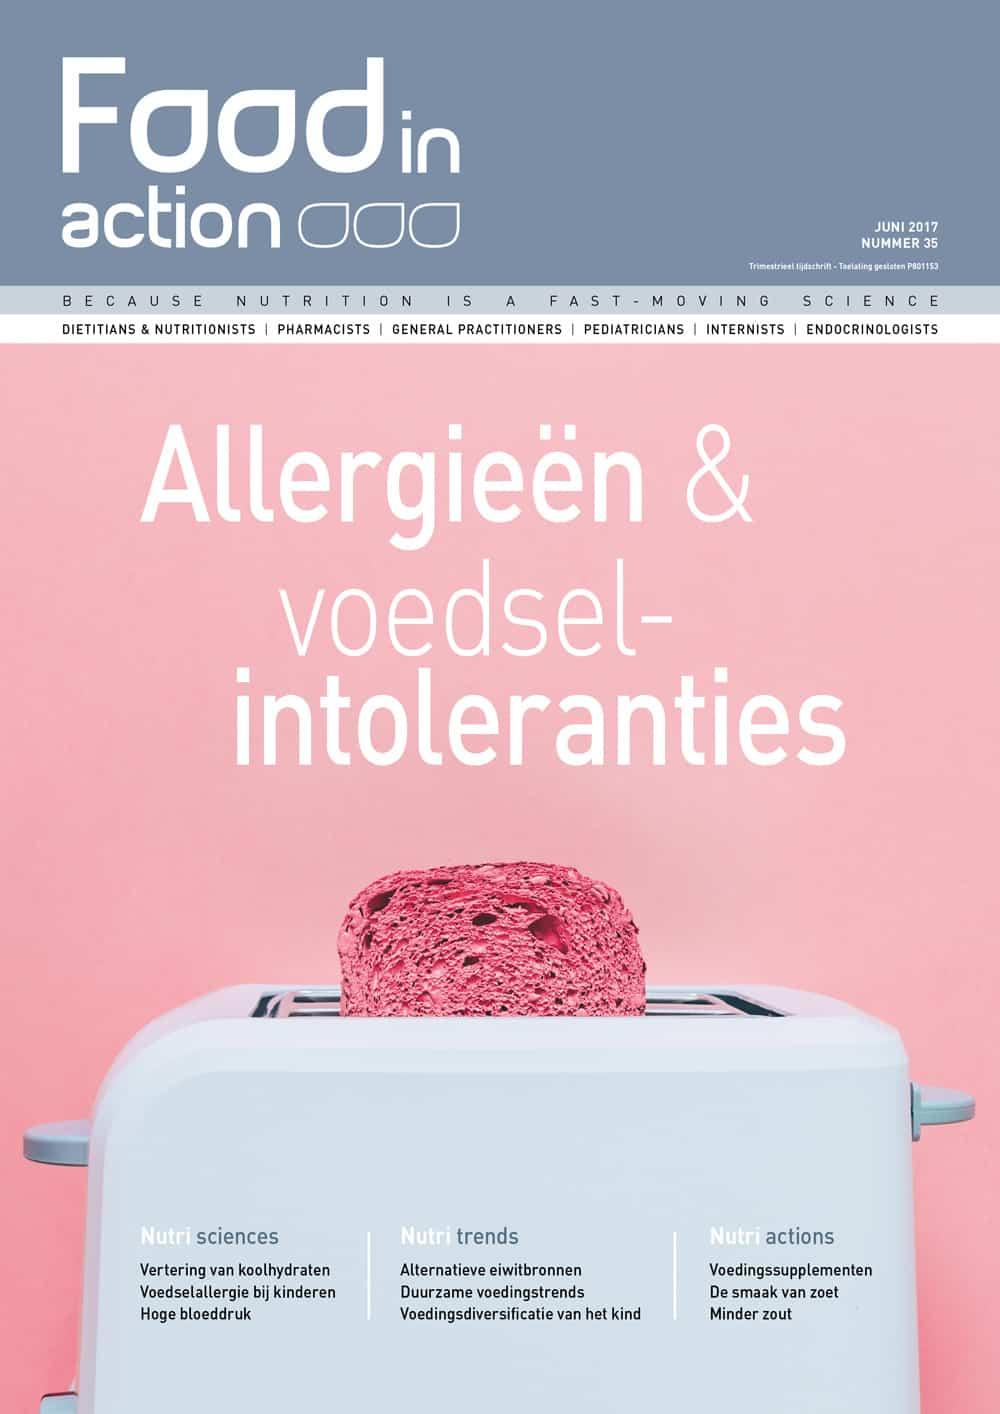 fia-mag-juni-2017-allergieen